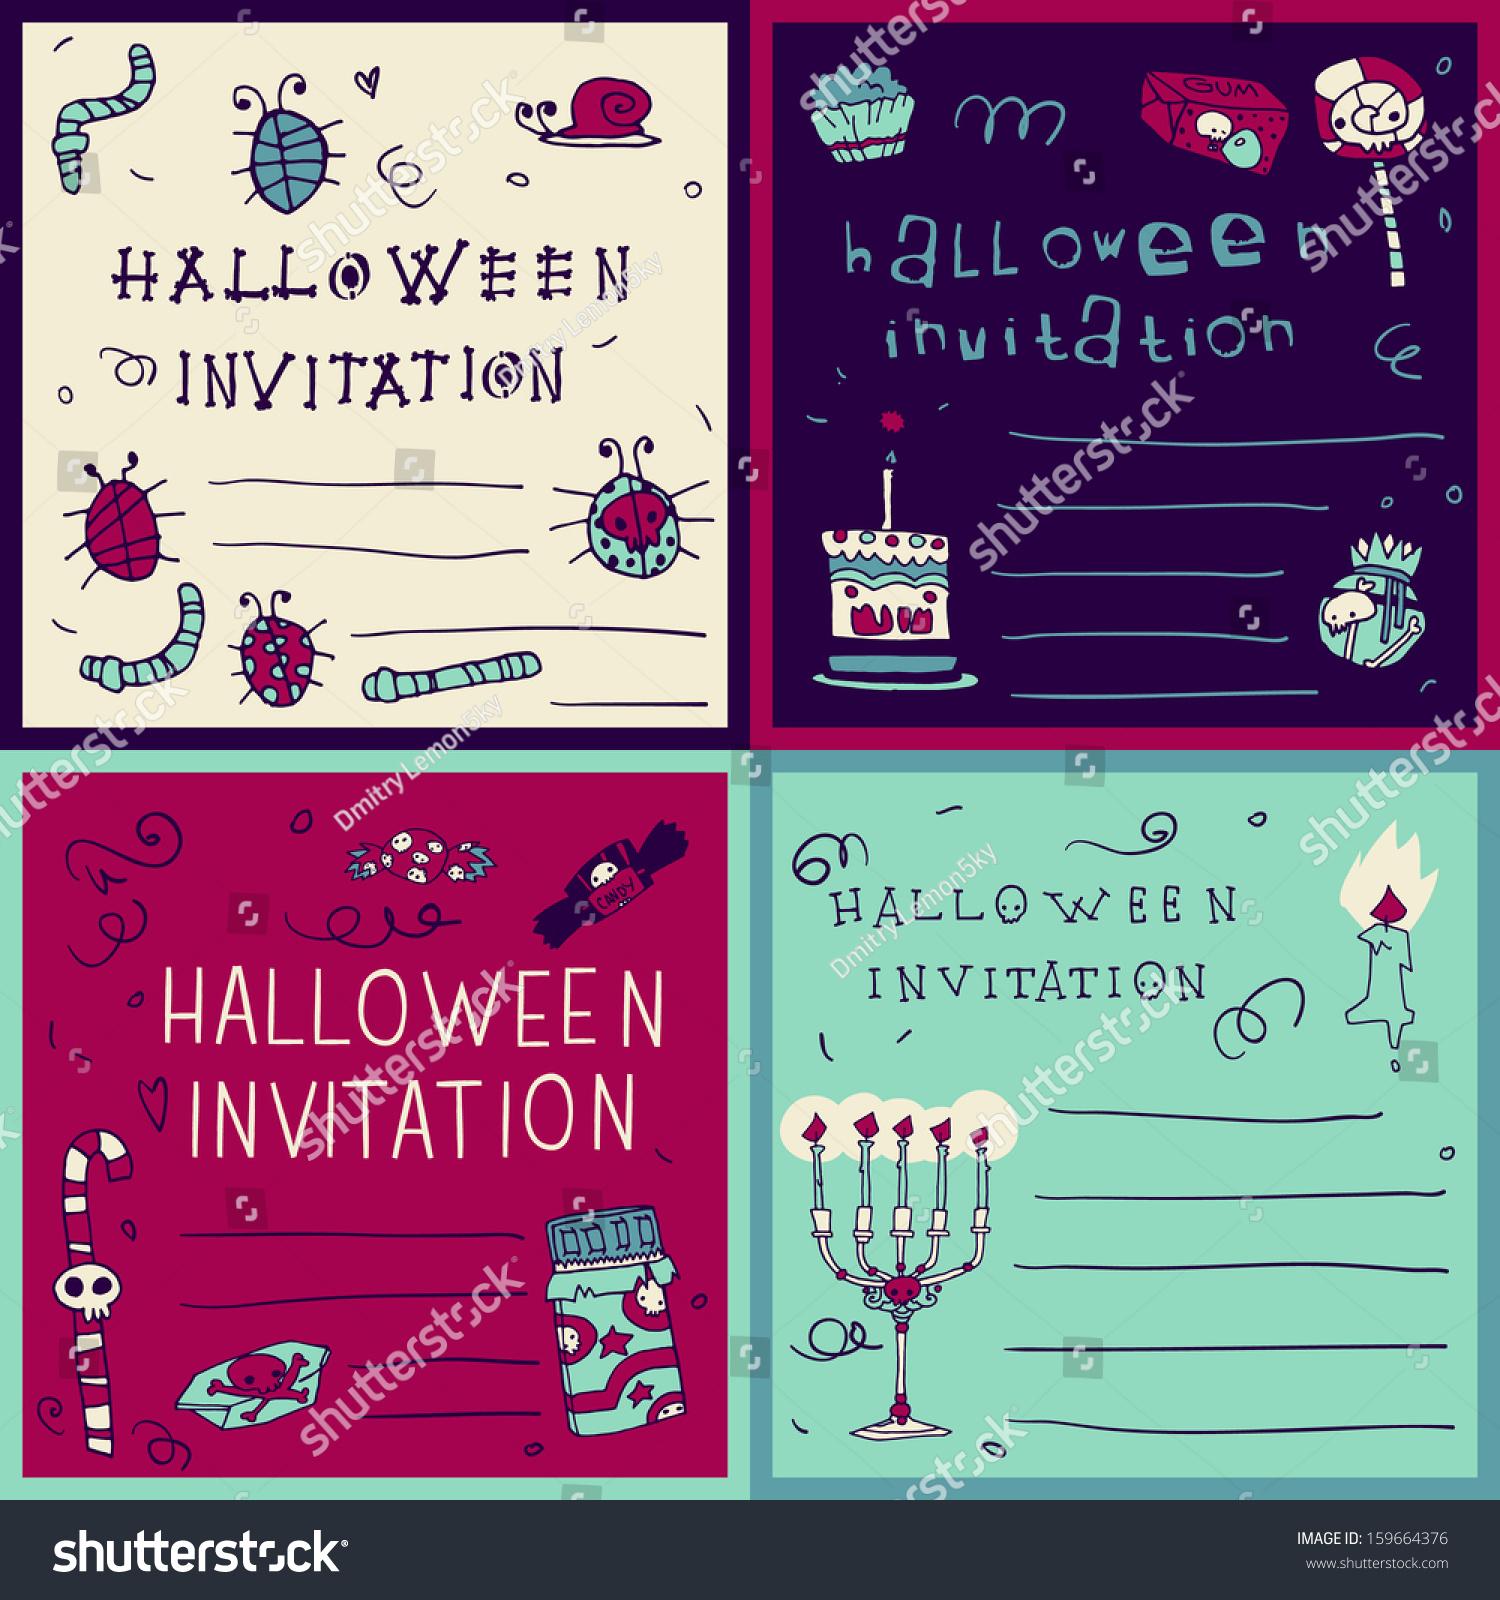 invitations cardswebsitesbackground websites home - photo #27